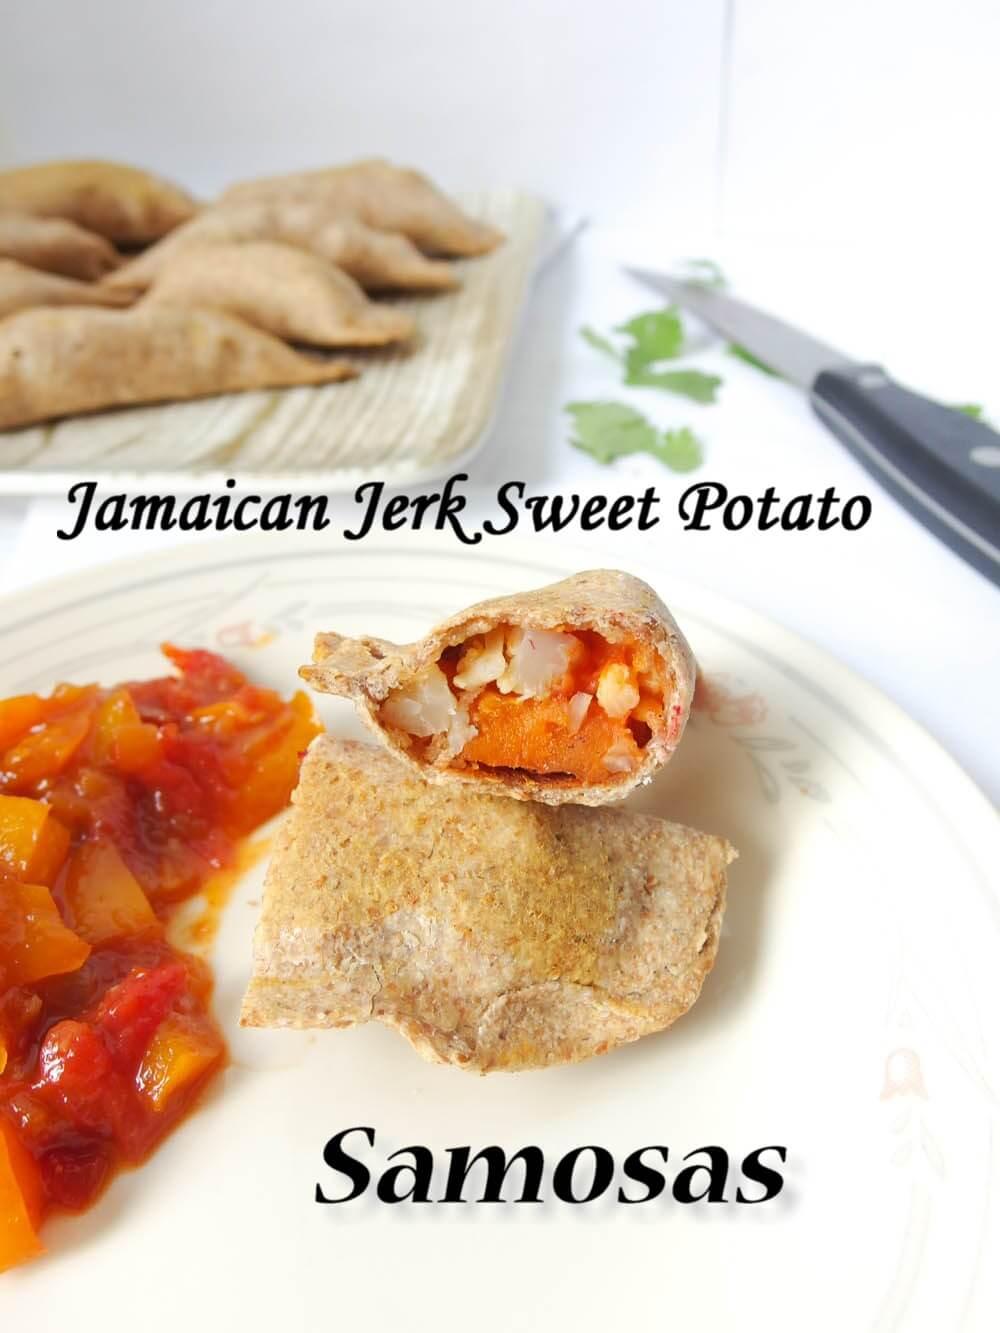 Baked Jamaican Jerk Sweet Potato Samosas with Grapefruit Chutney